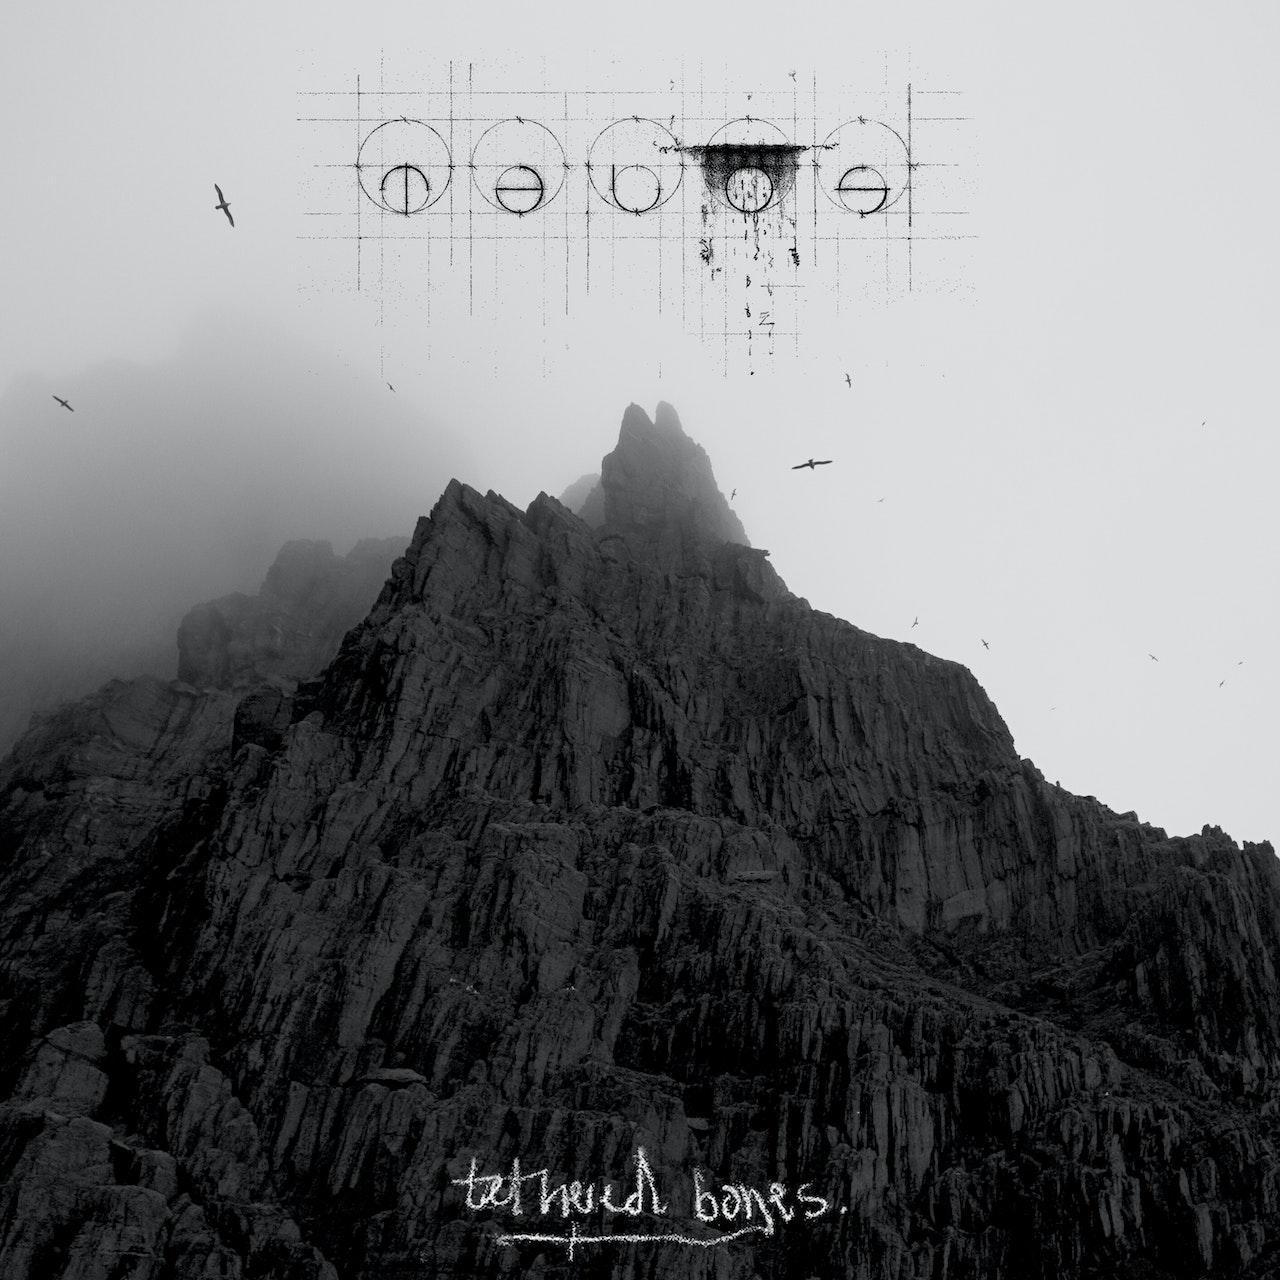 Talos - Tethered Bones (EP) ~ 2014